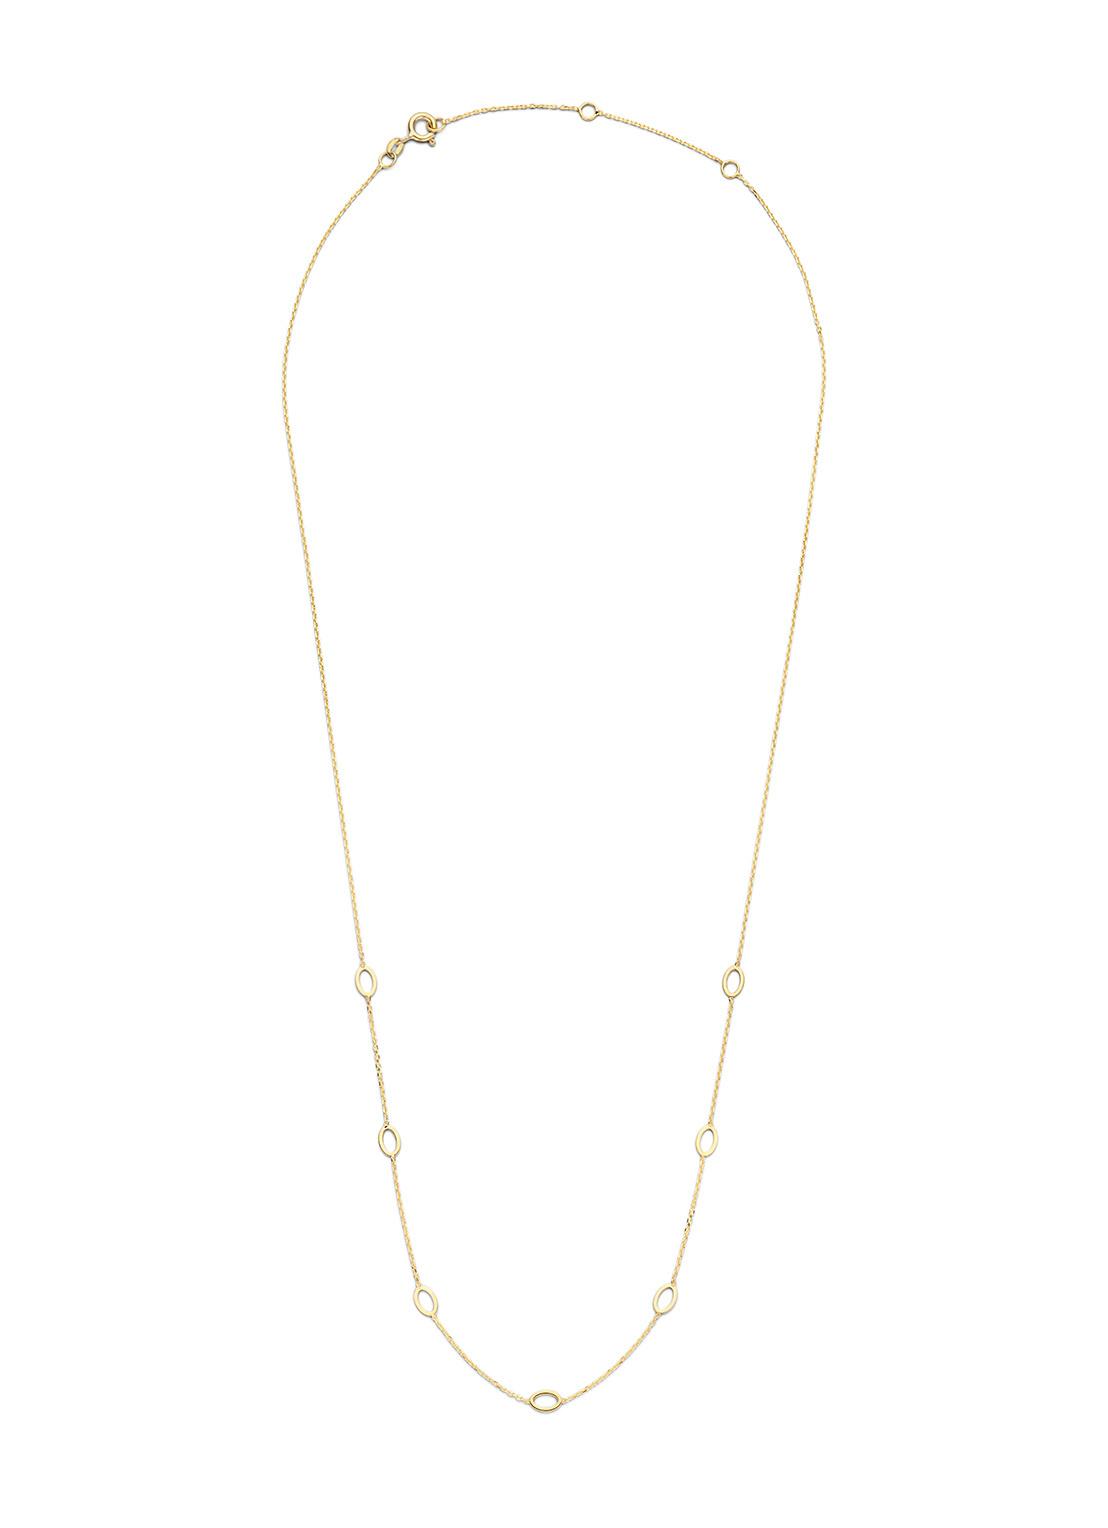 14 karaat geelgouden dames ketting - Jackie - Long Ovals Necklace-2